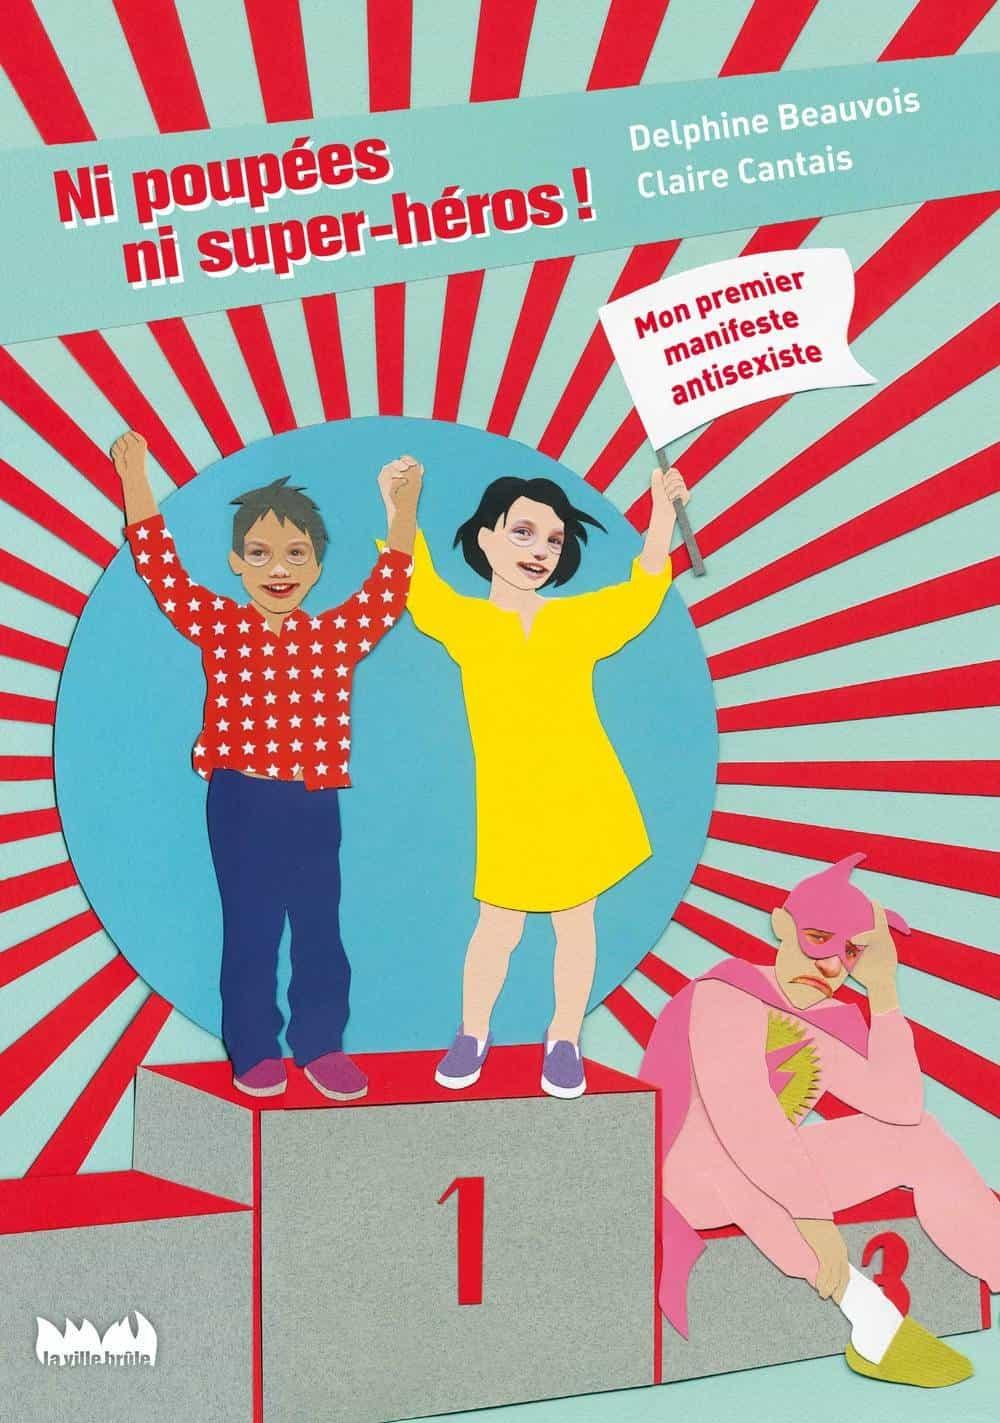 ni-poupees-ni-super-heros-livre-enfant-parite